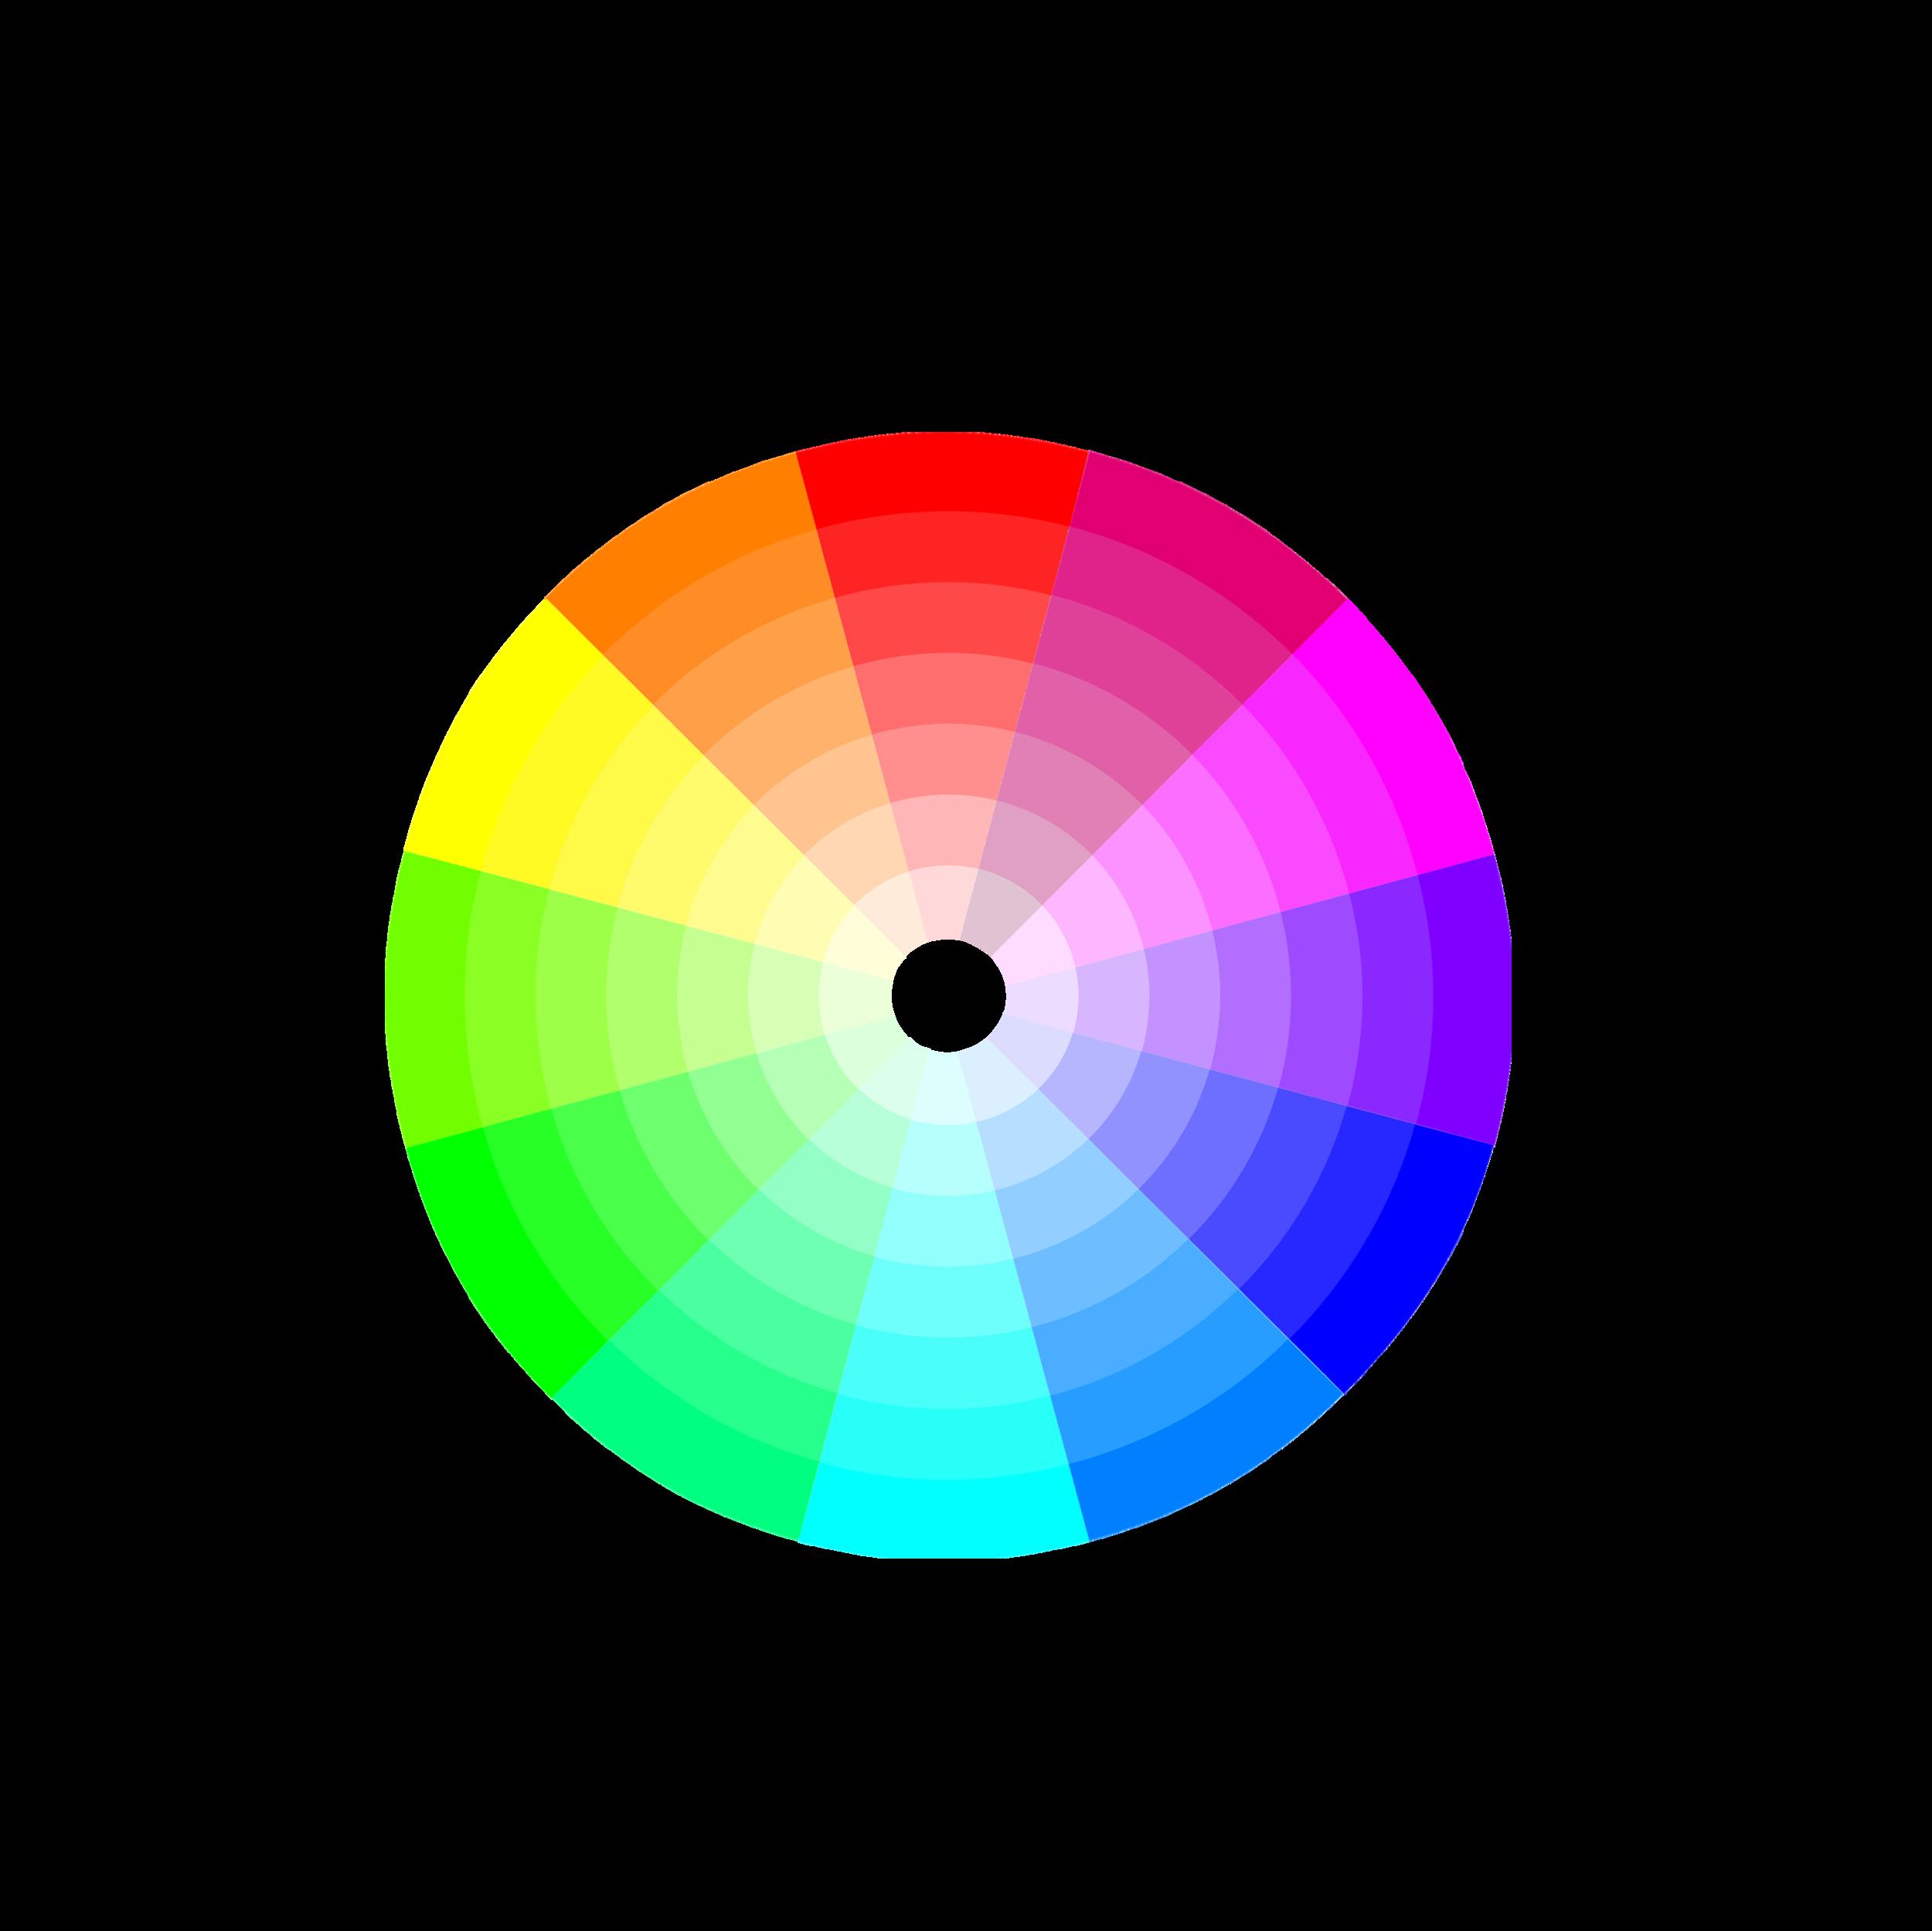 colorwheel_square_WEB.png